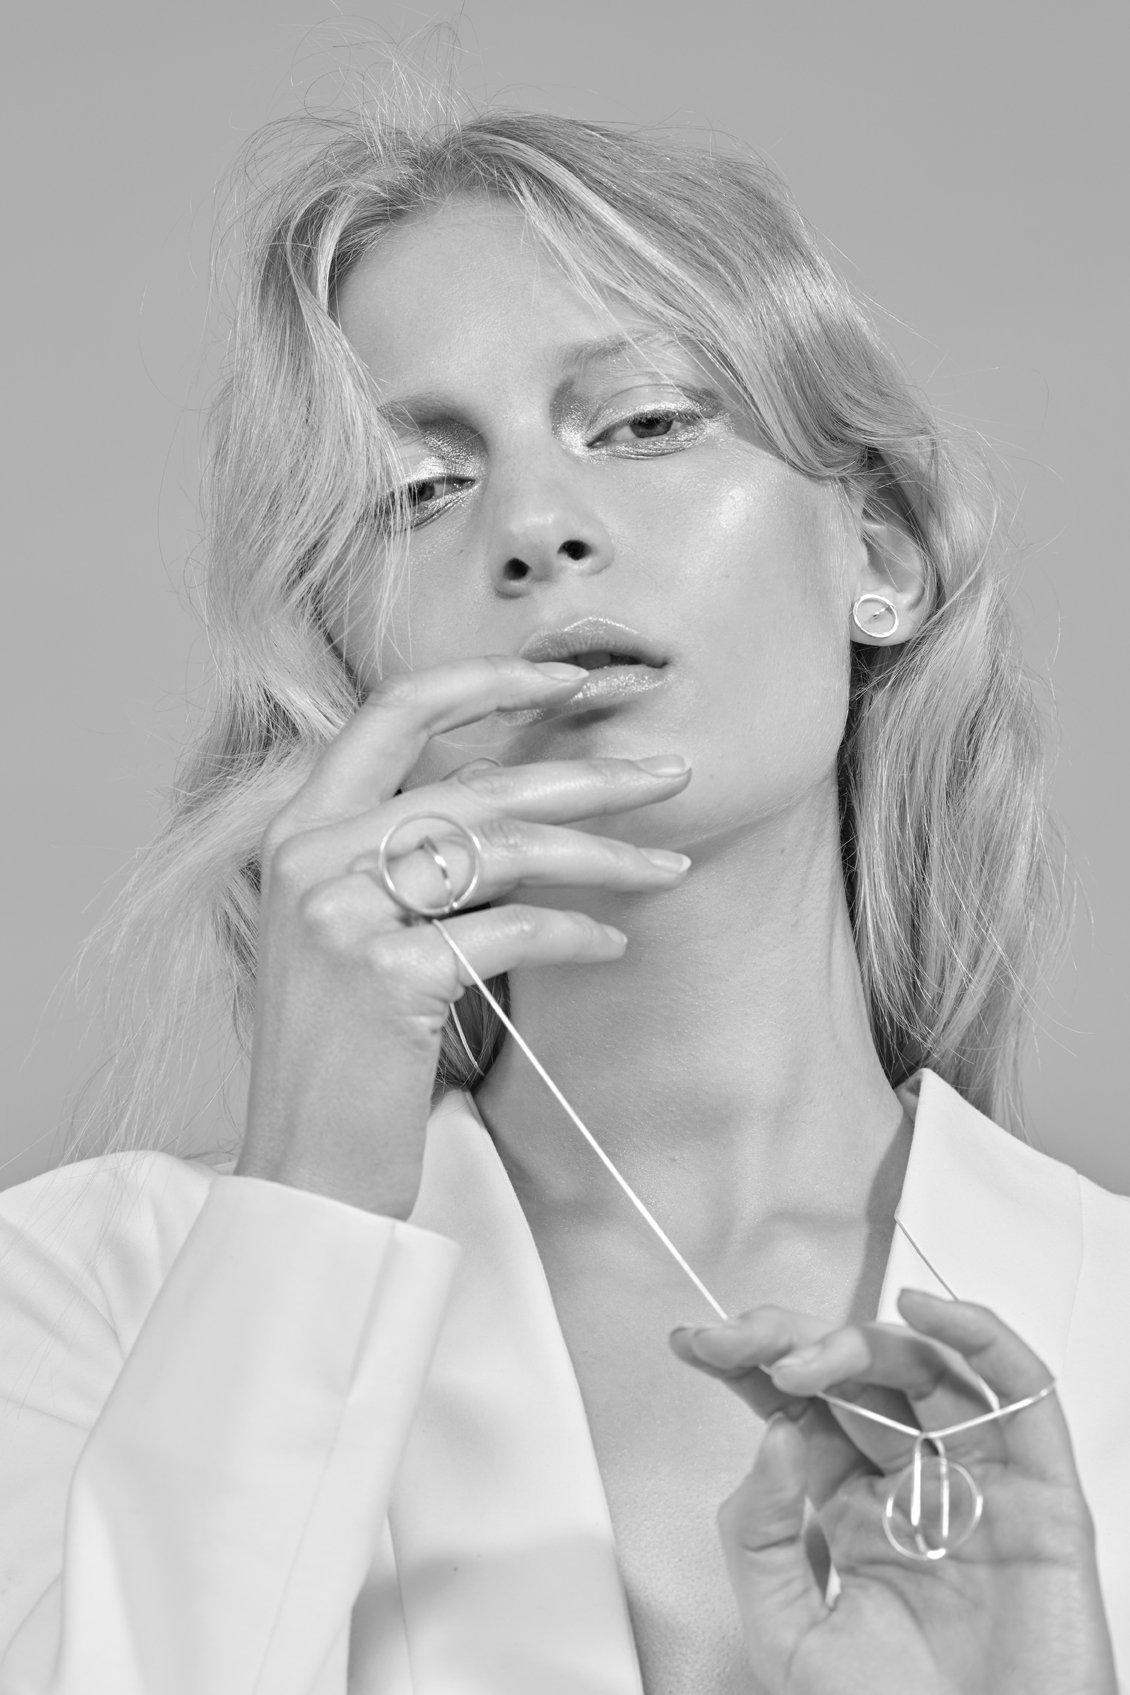 Biżuteria Balance projektu Kasi Wójcik